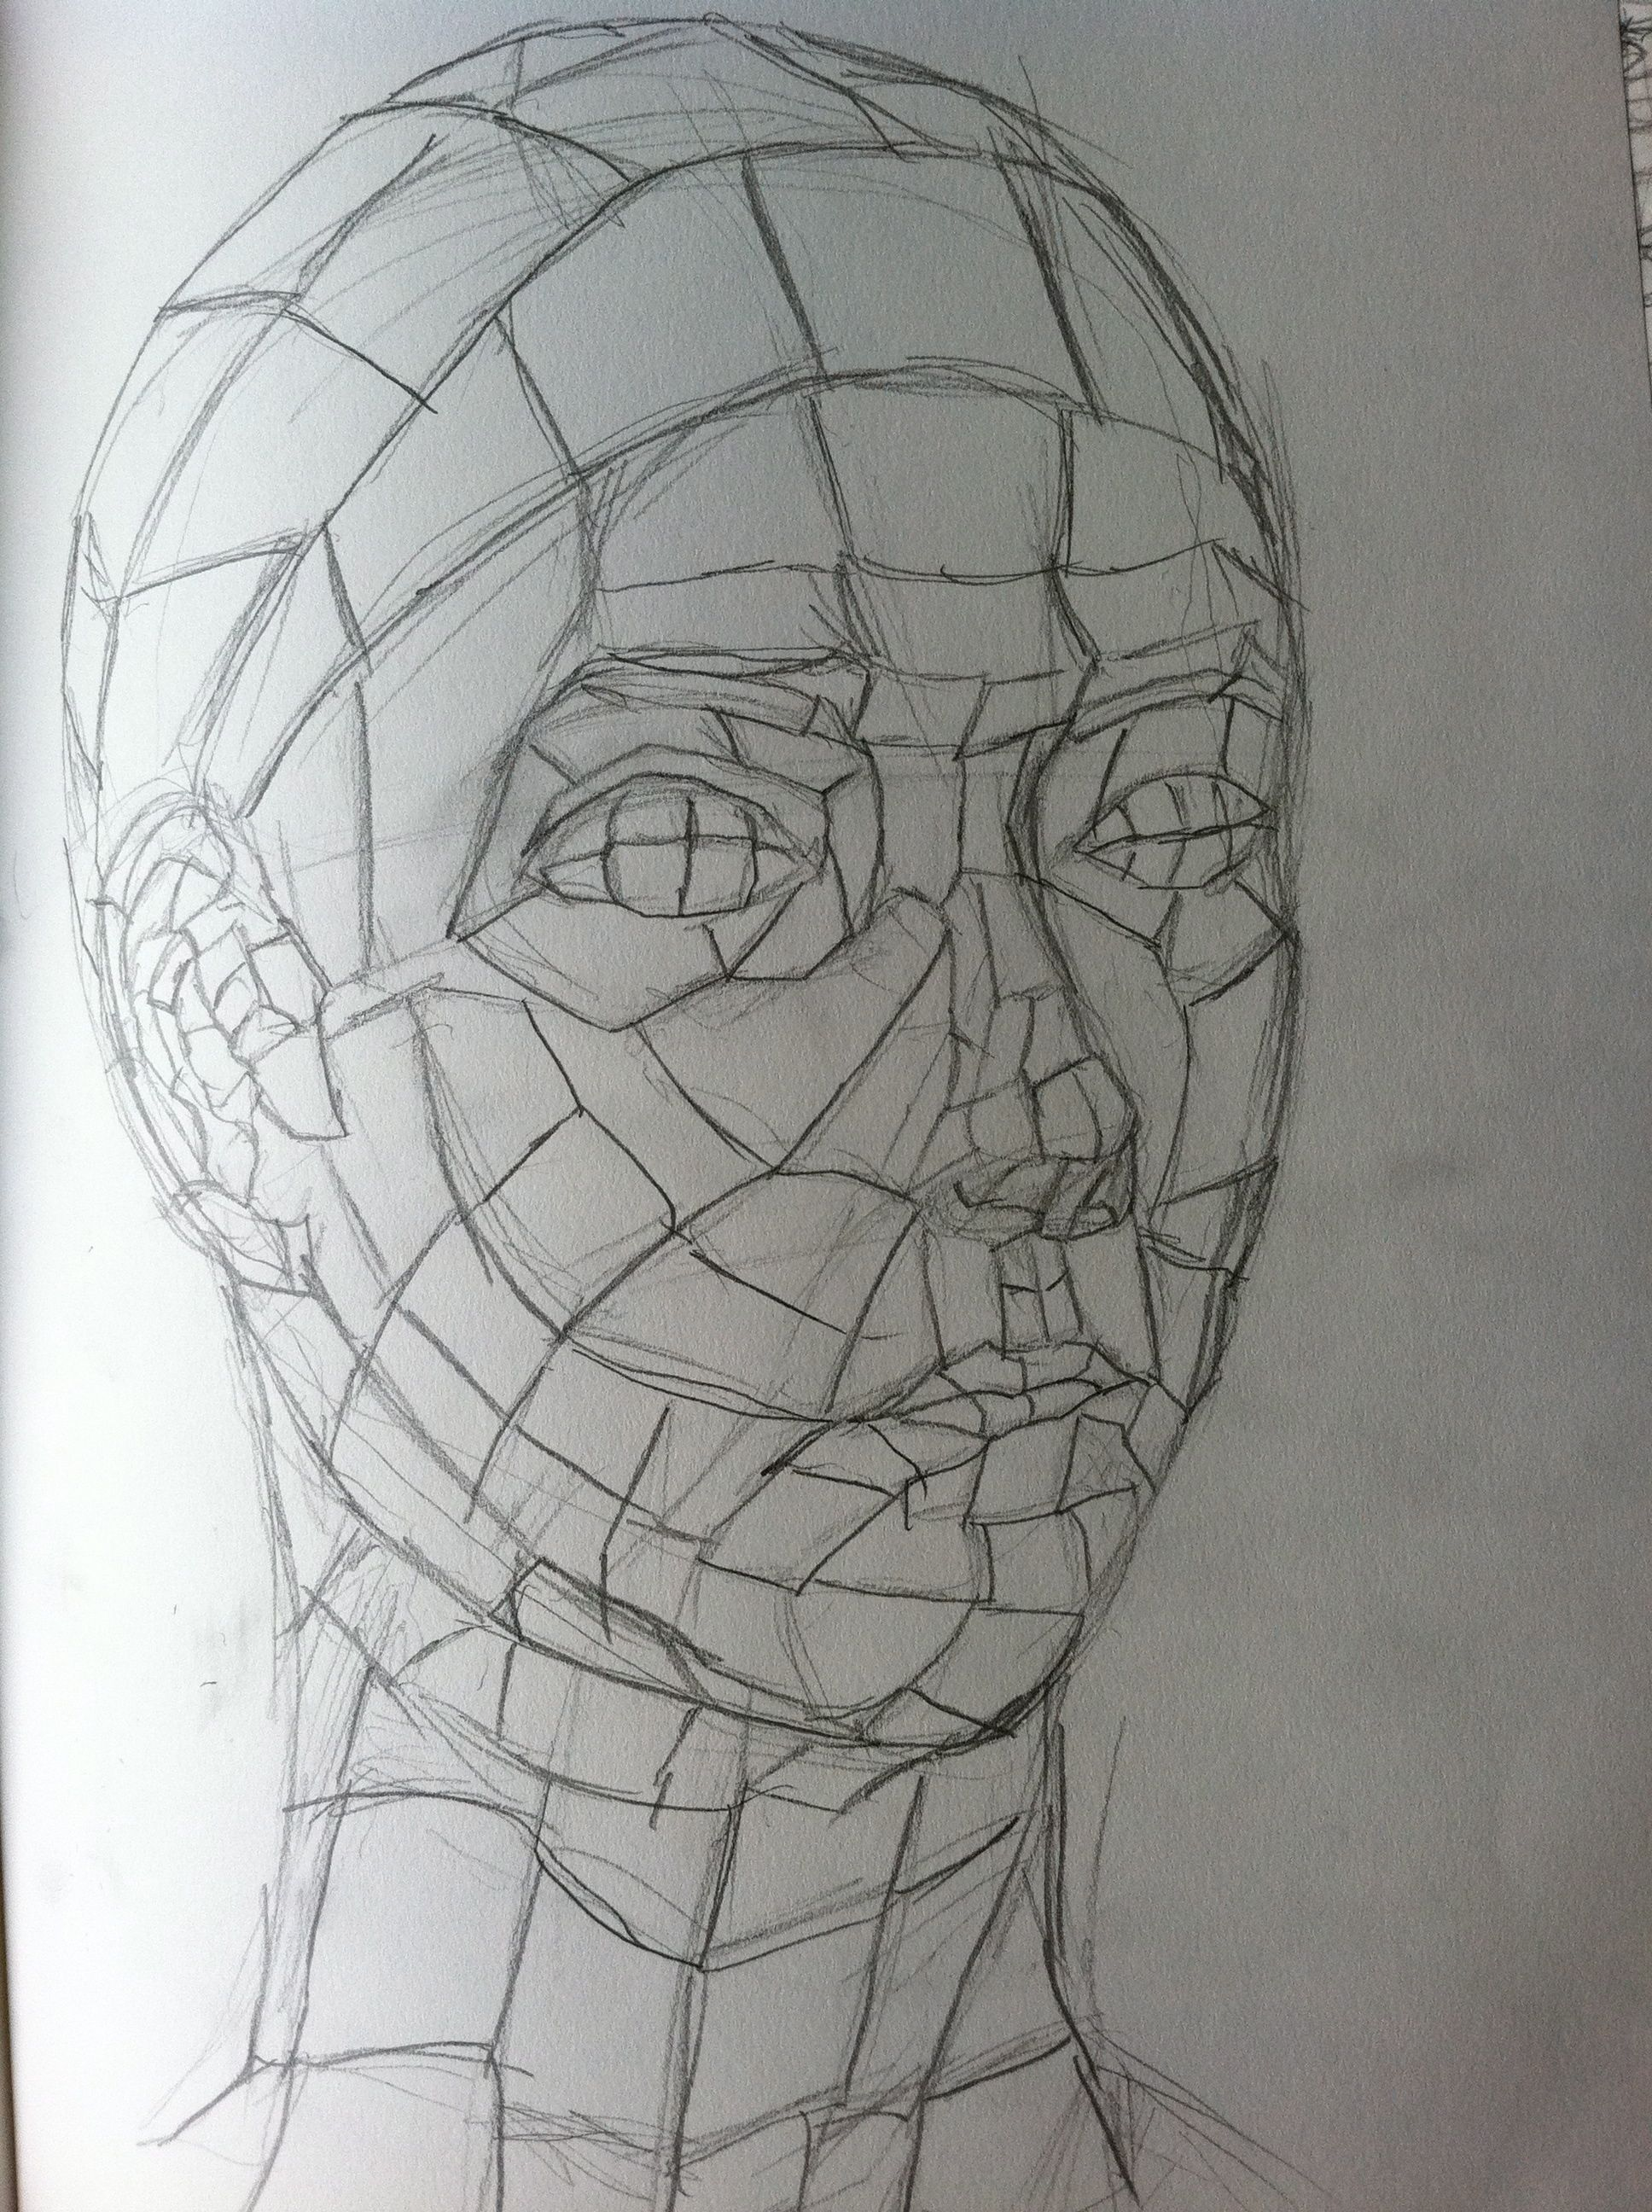 Contour Line Drawing Middle School : Cross contour lines contours low poly and portraits